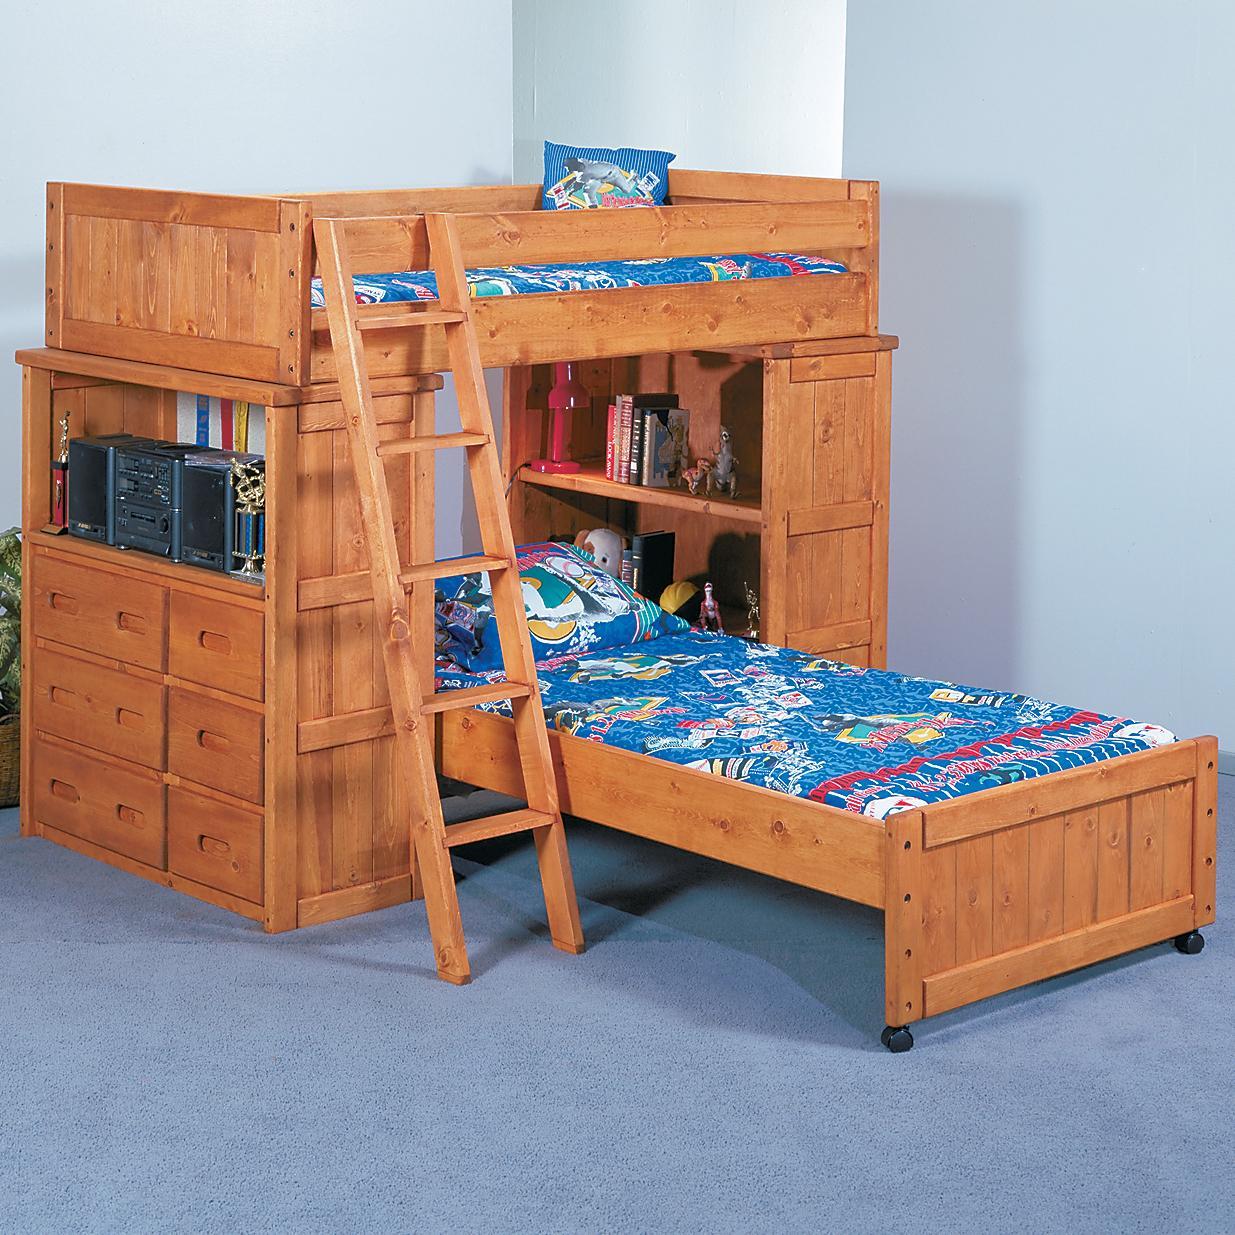 trendwood bunkhouse twin twin roundup modular loft bed with dresser and shelf units olinde 39 s. Black Bedroom Furniture Sets. Home Design Ideas